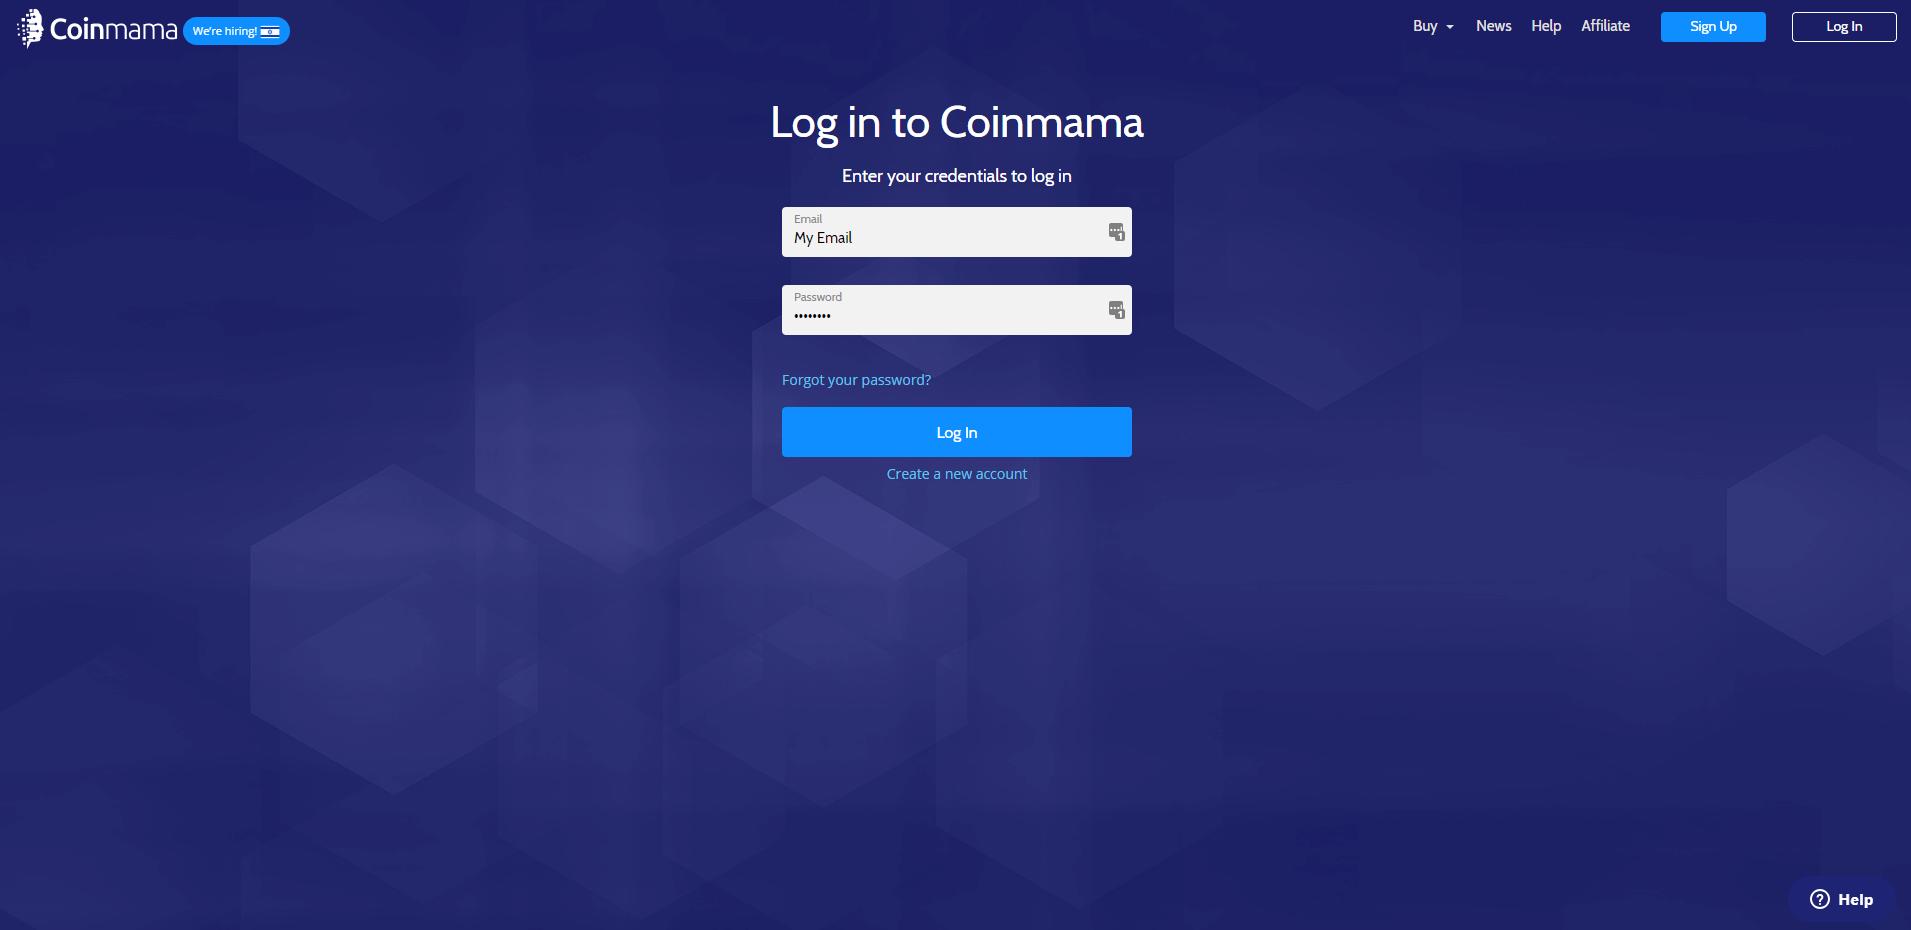 login to Coinmama